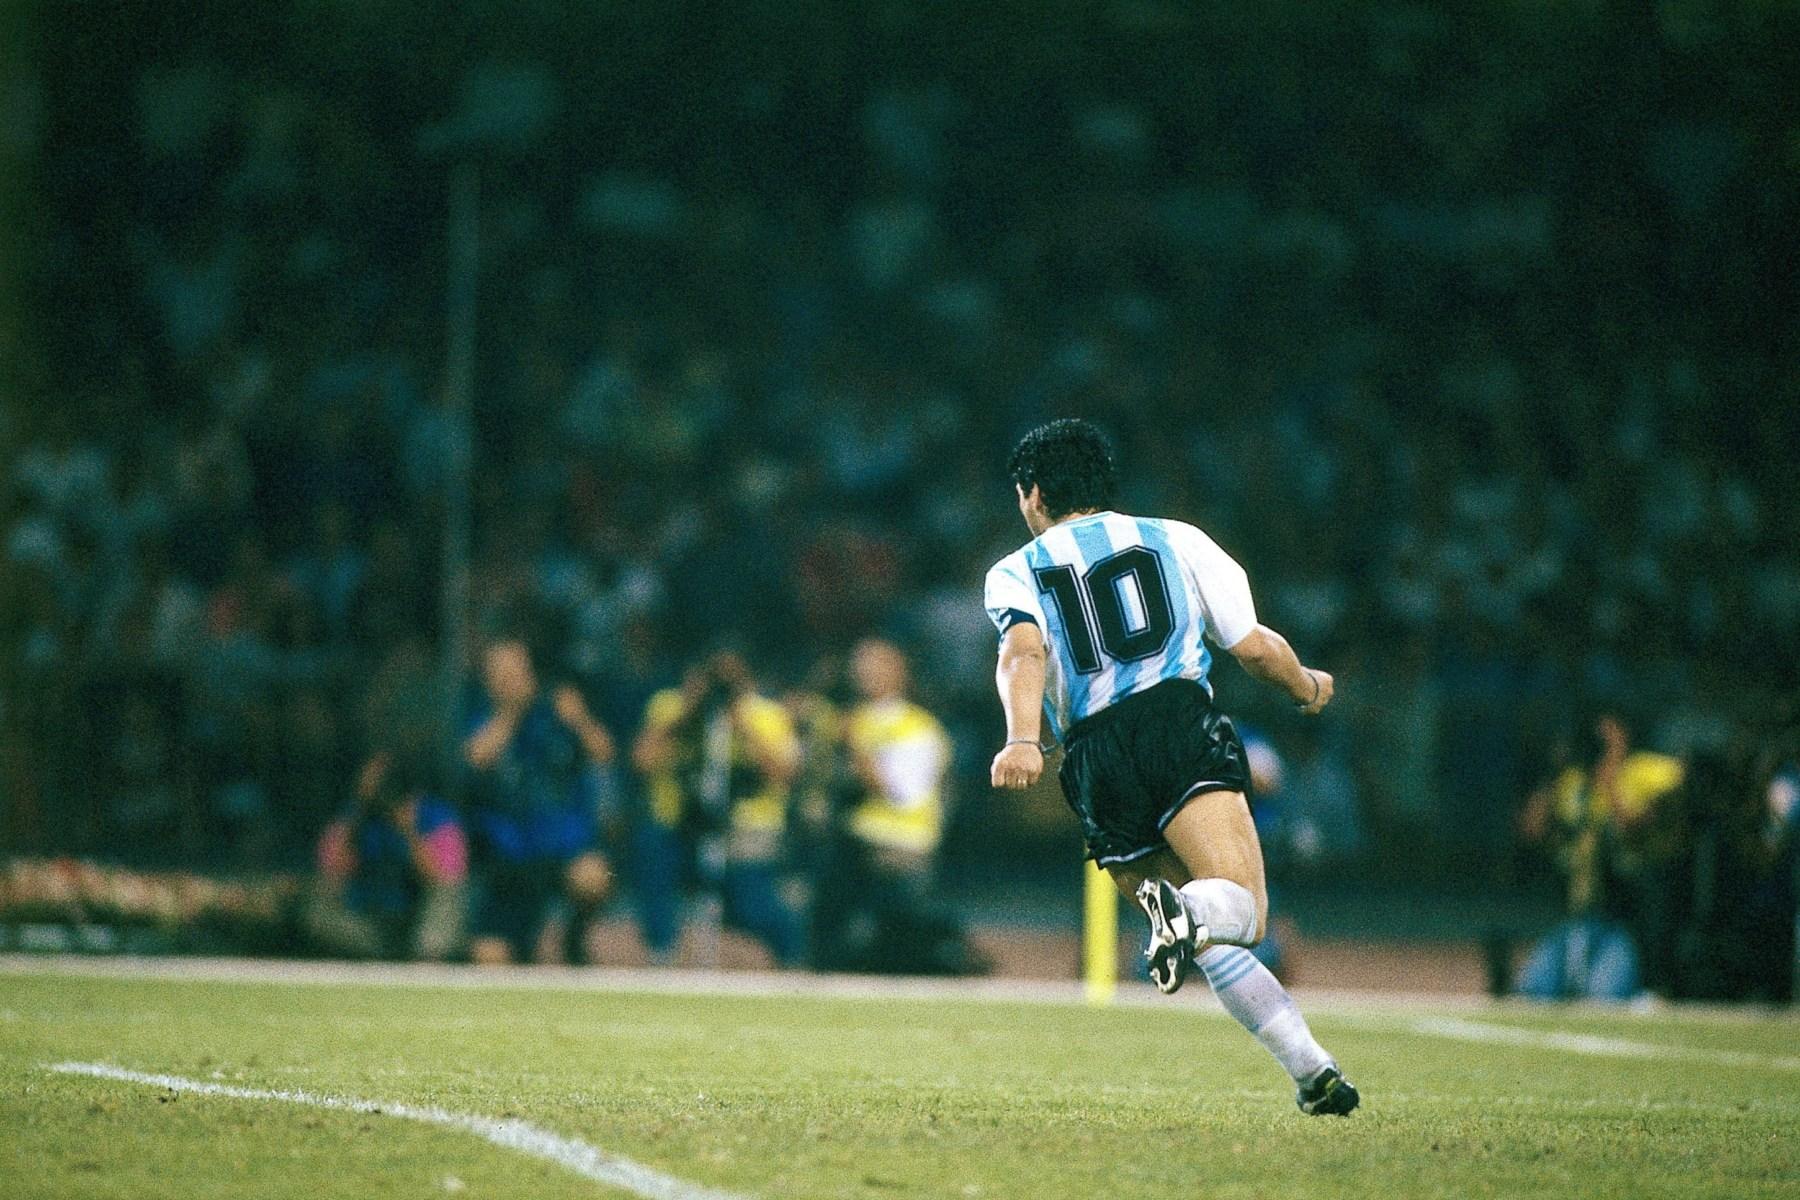 Free Maradona Wallpapers 1324953 Hd Wallpaper Backgrounds Download